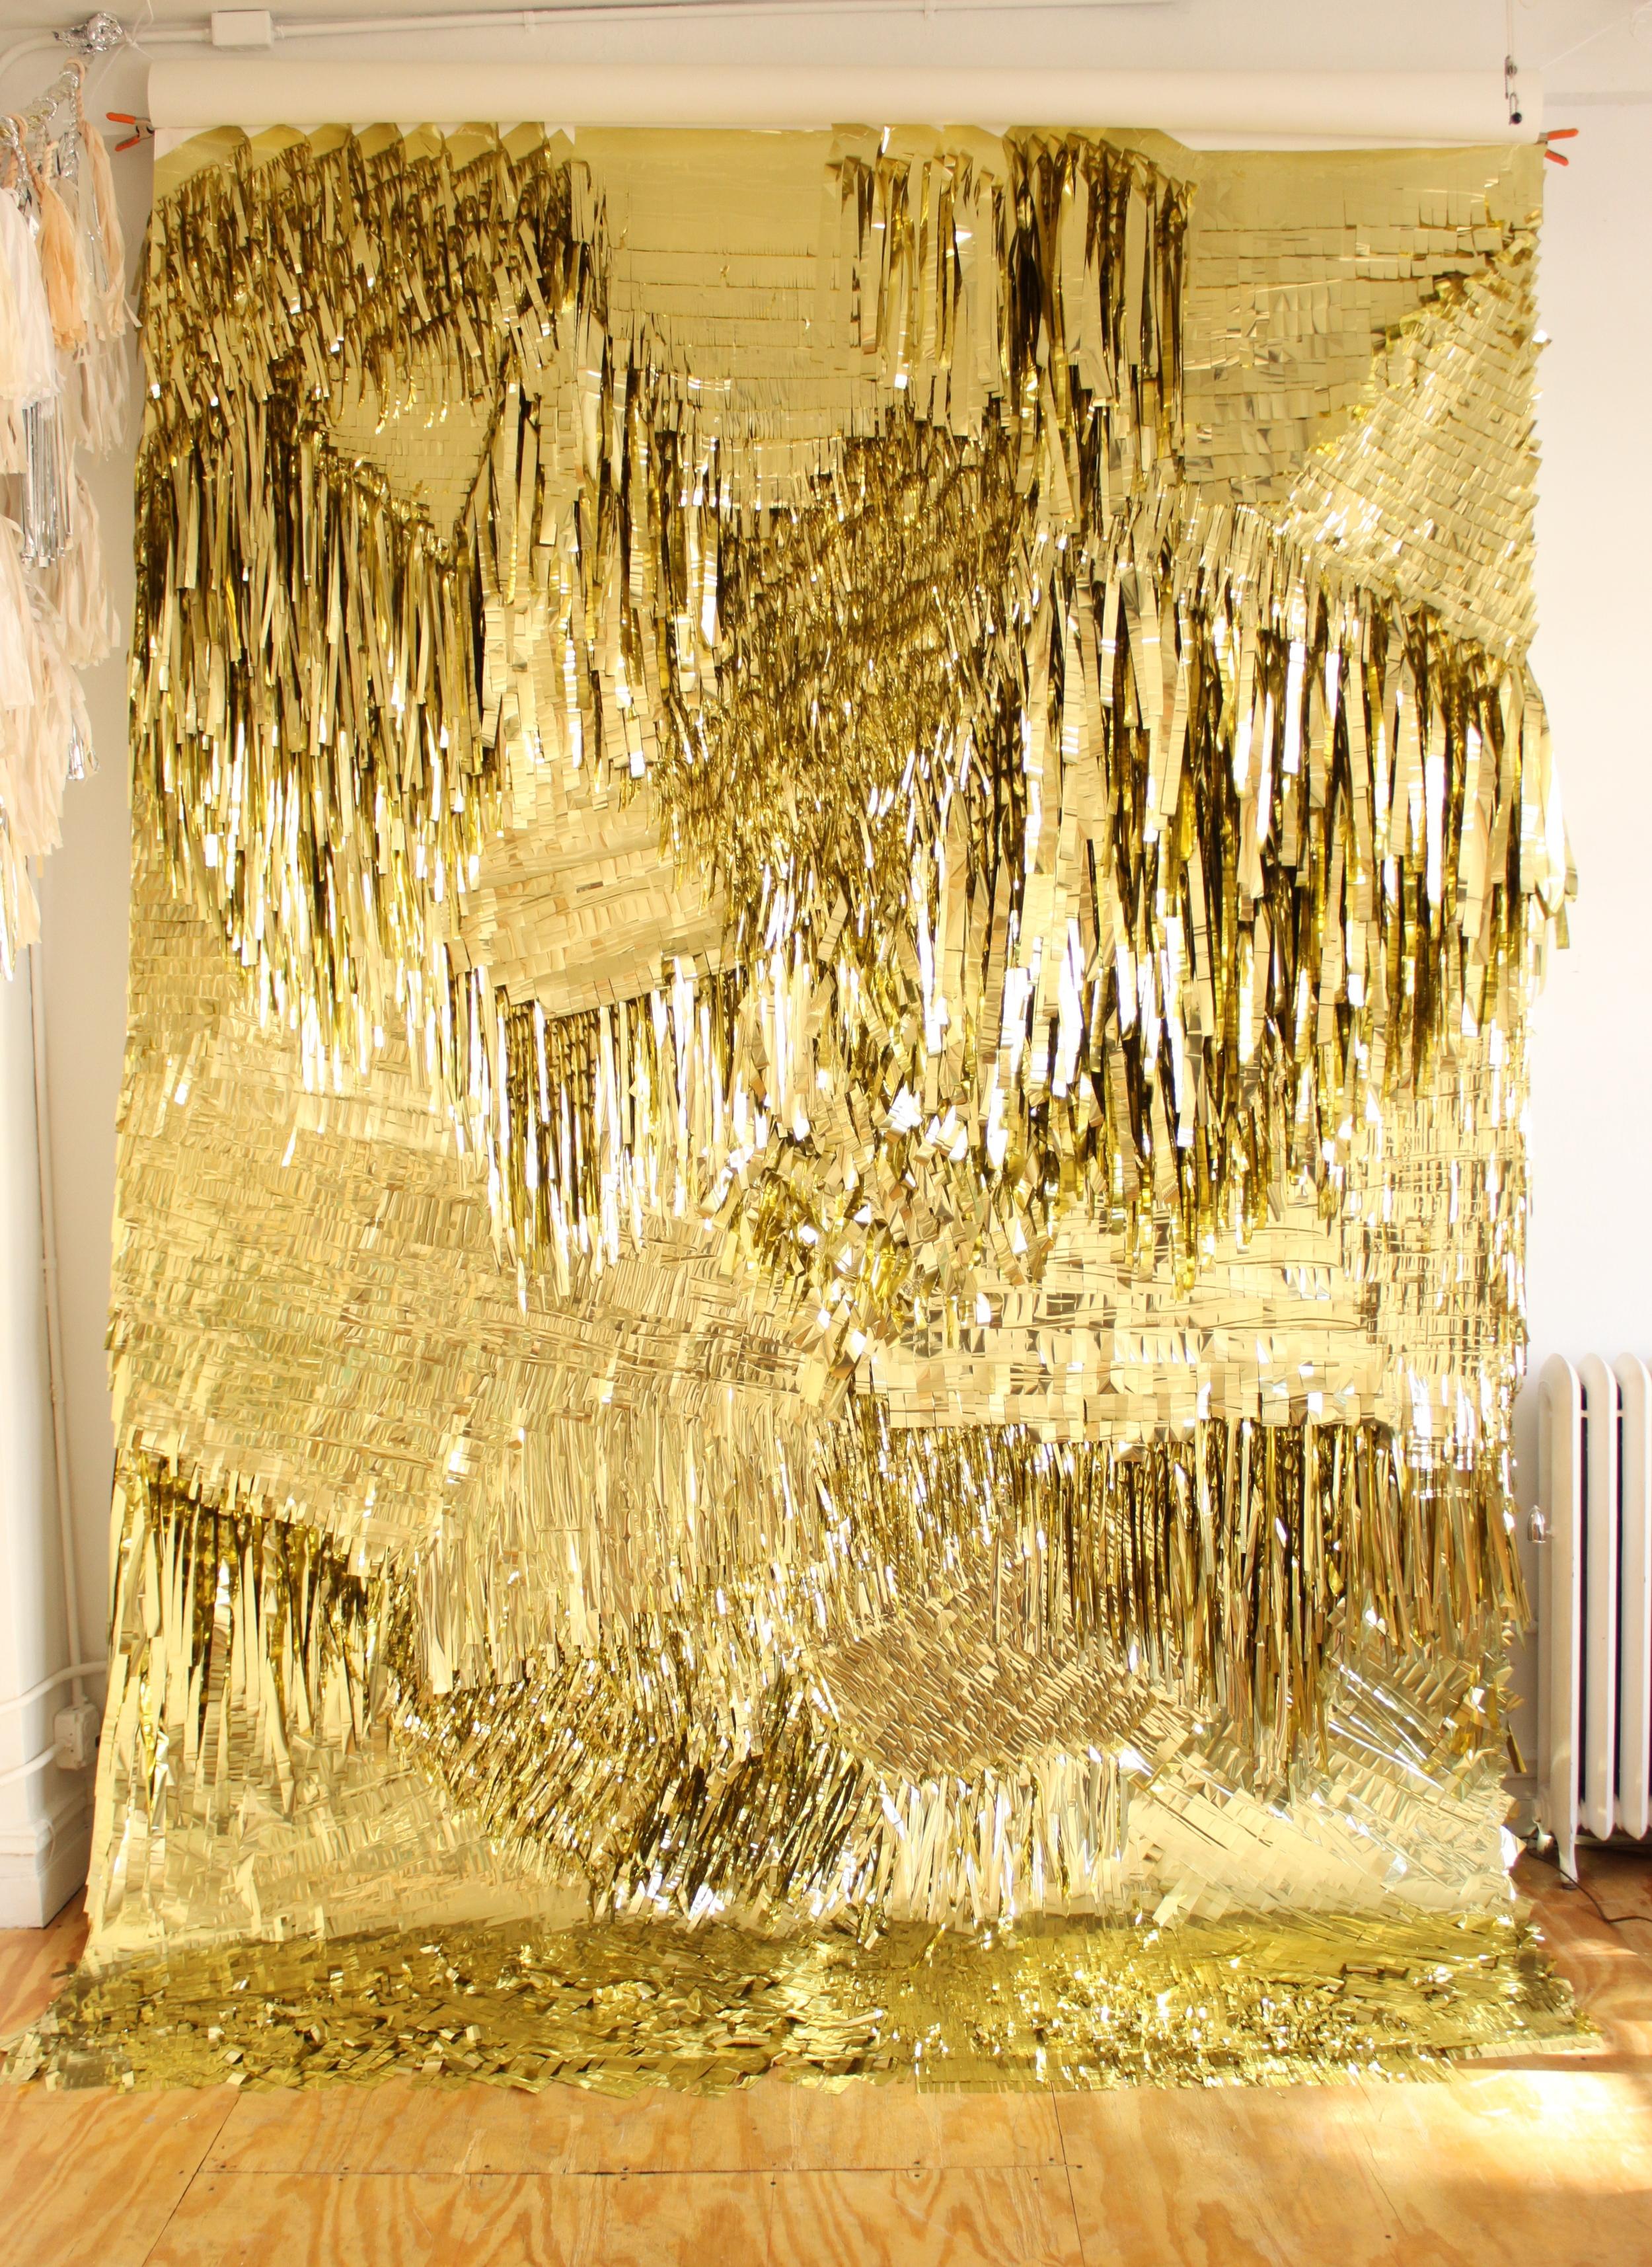 Gold Wall, 2010 CONFETTISYSTEM,Metallic foil, canvas Photo: CONFETTISYSTEM